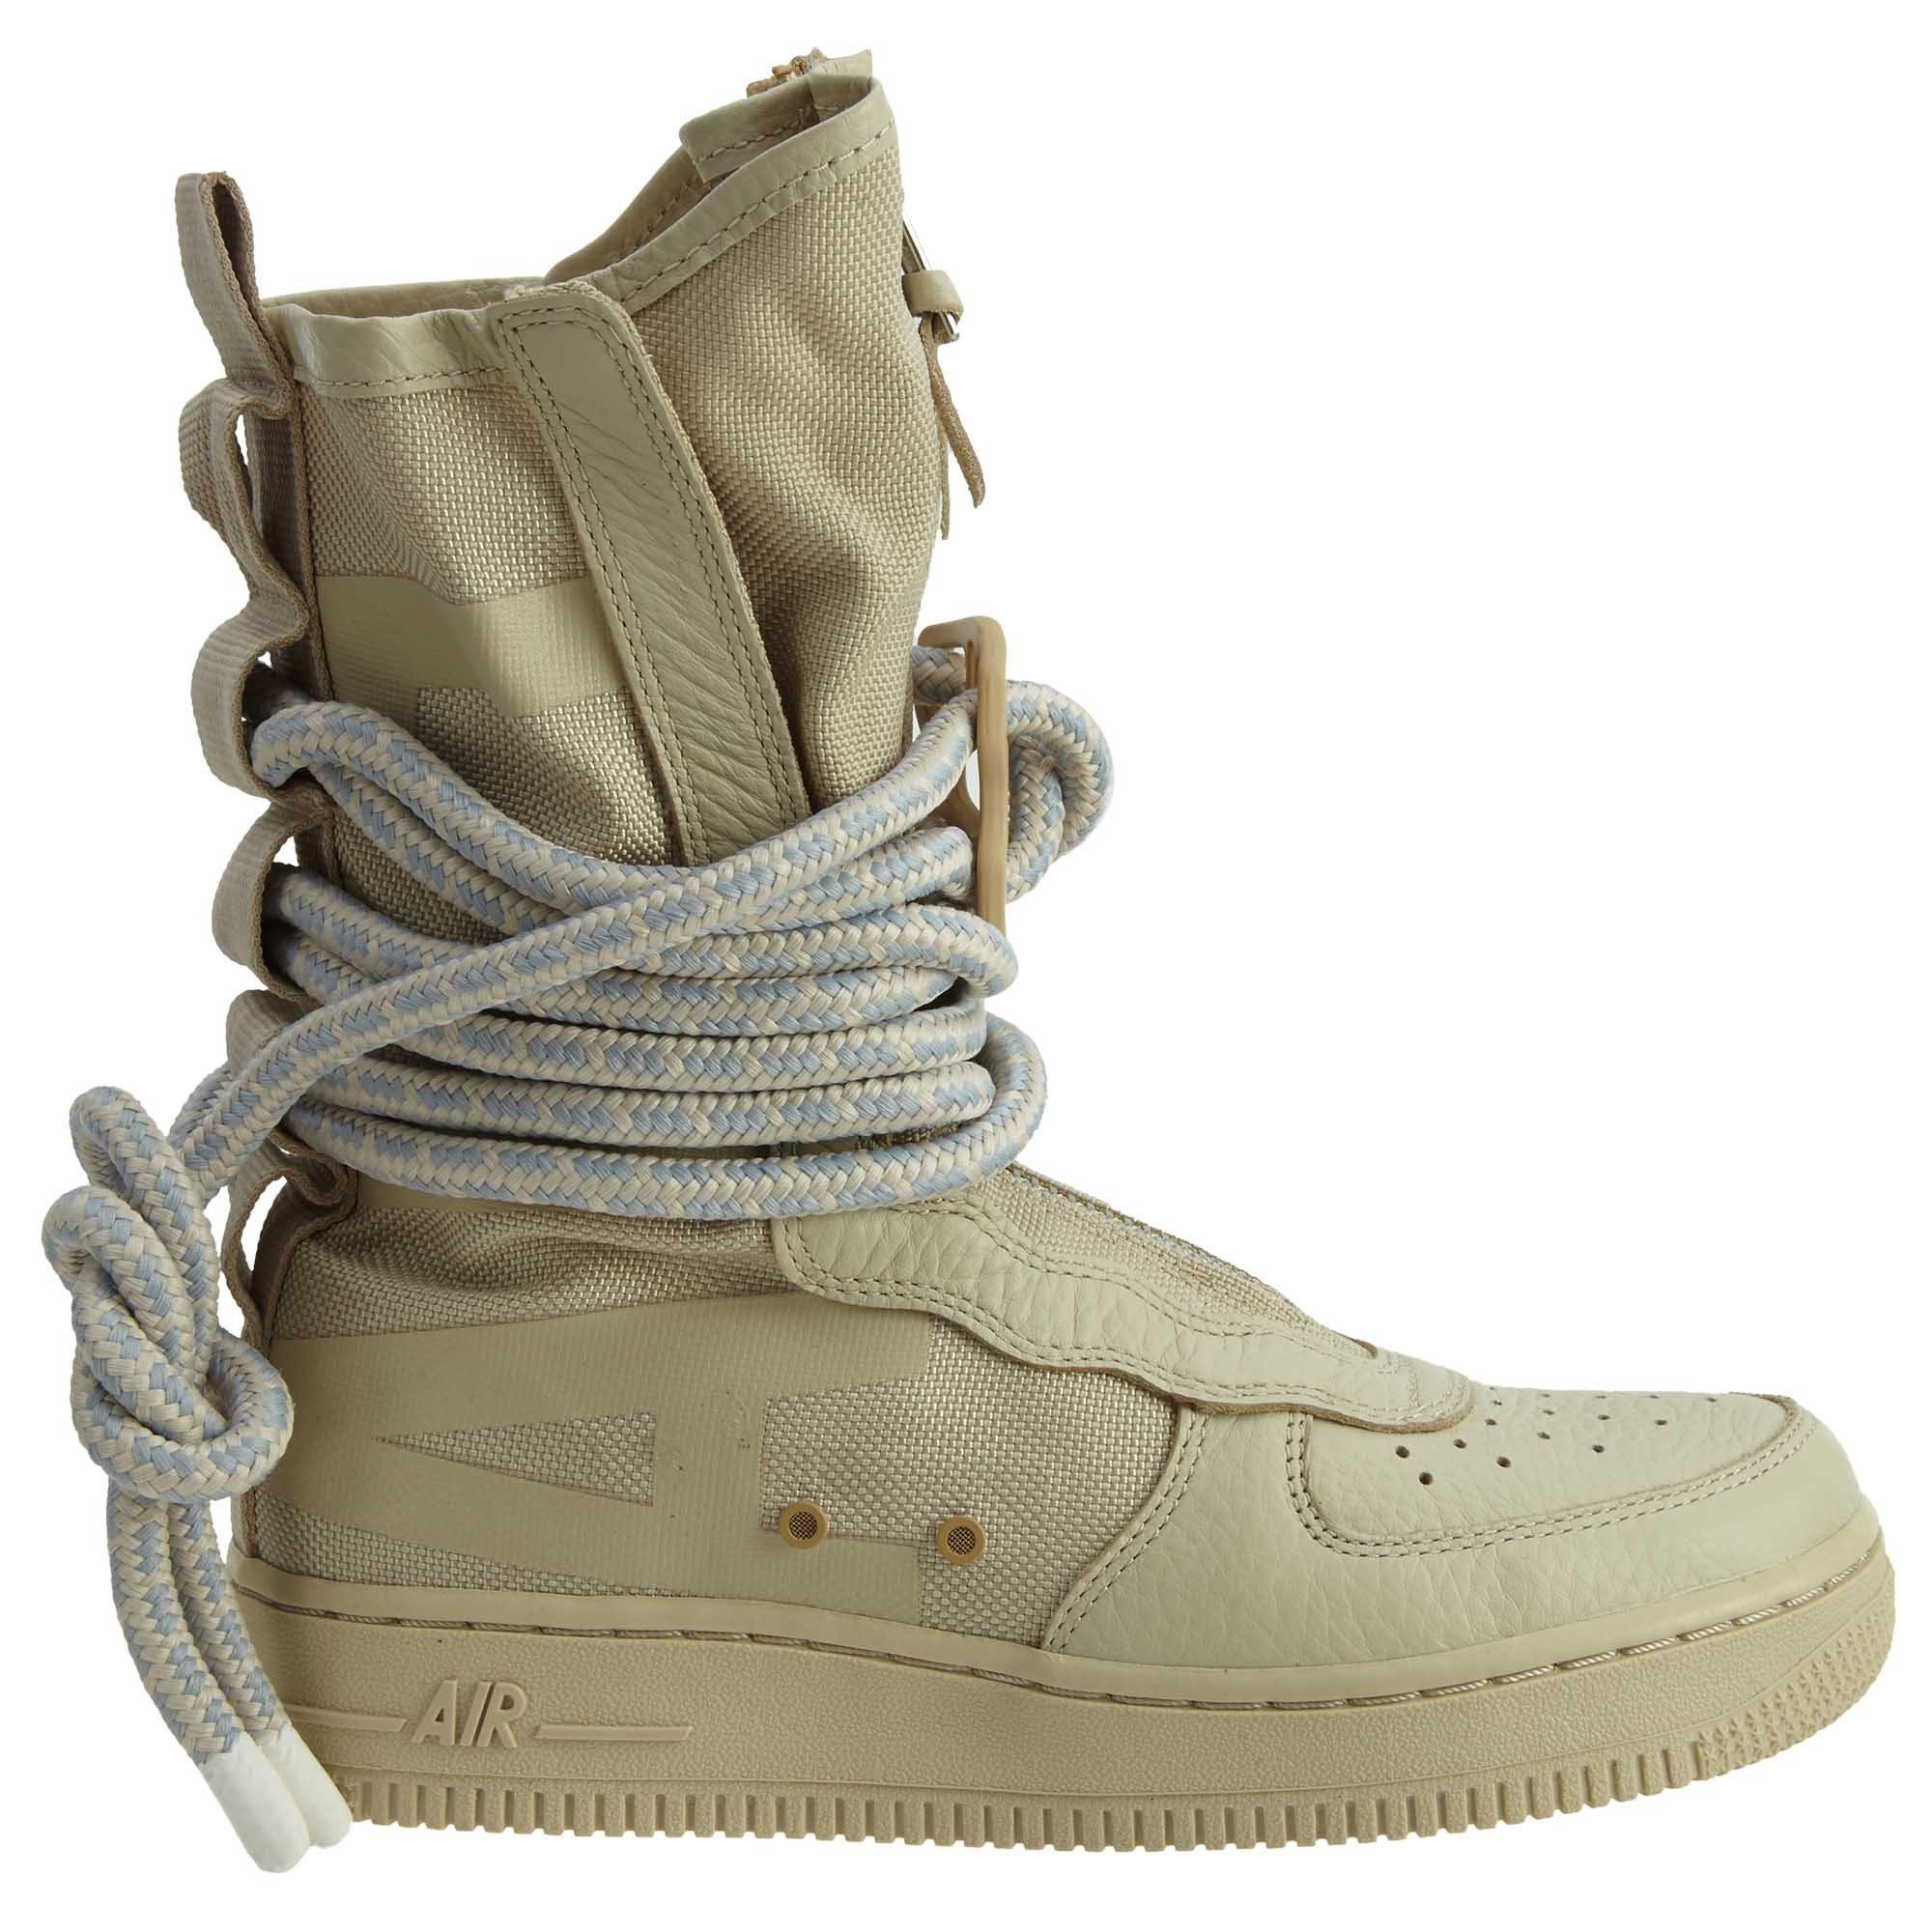 Nike Sf Af1 Hi Womens Style : AA3965-200 Size : 8.5 B(M) US by NIKE (Image #2)